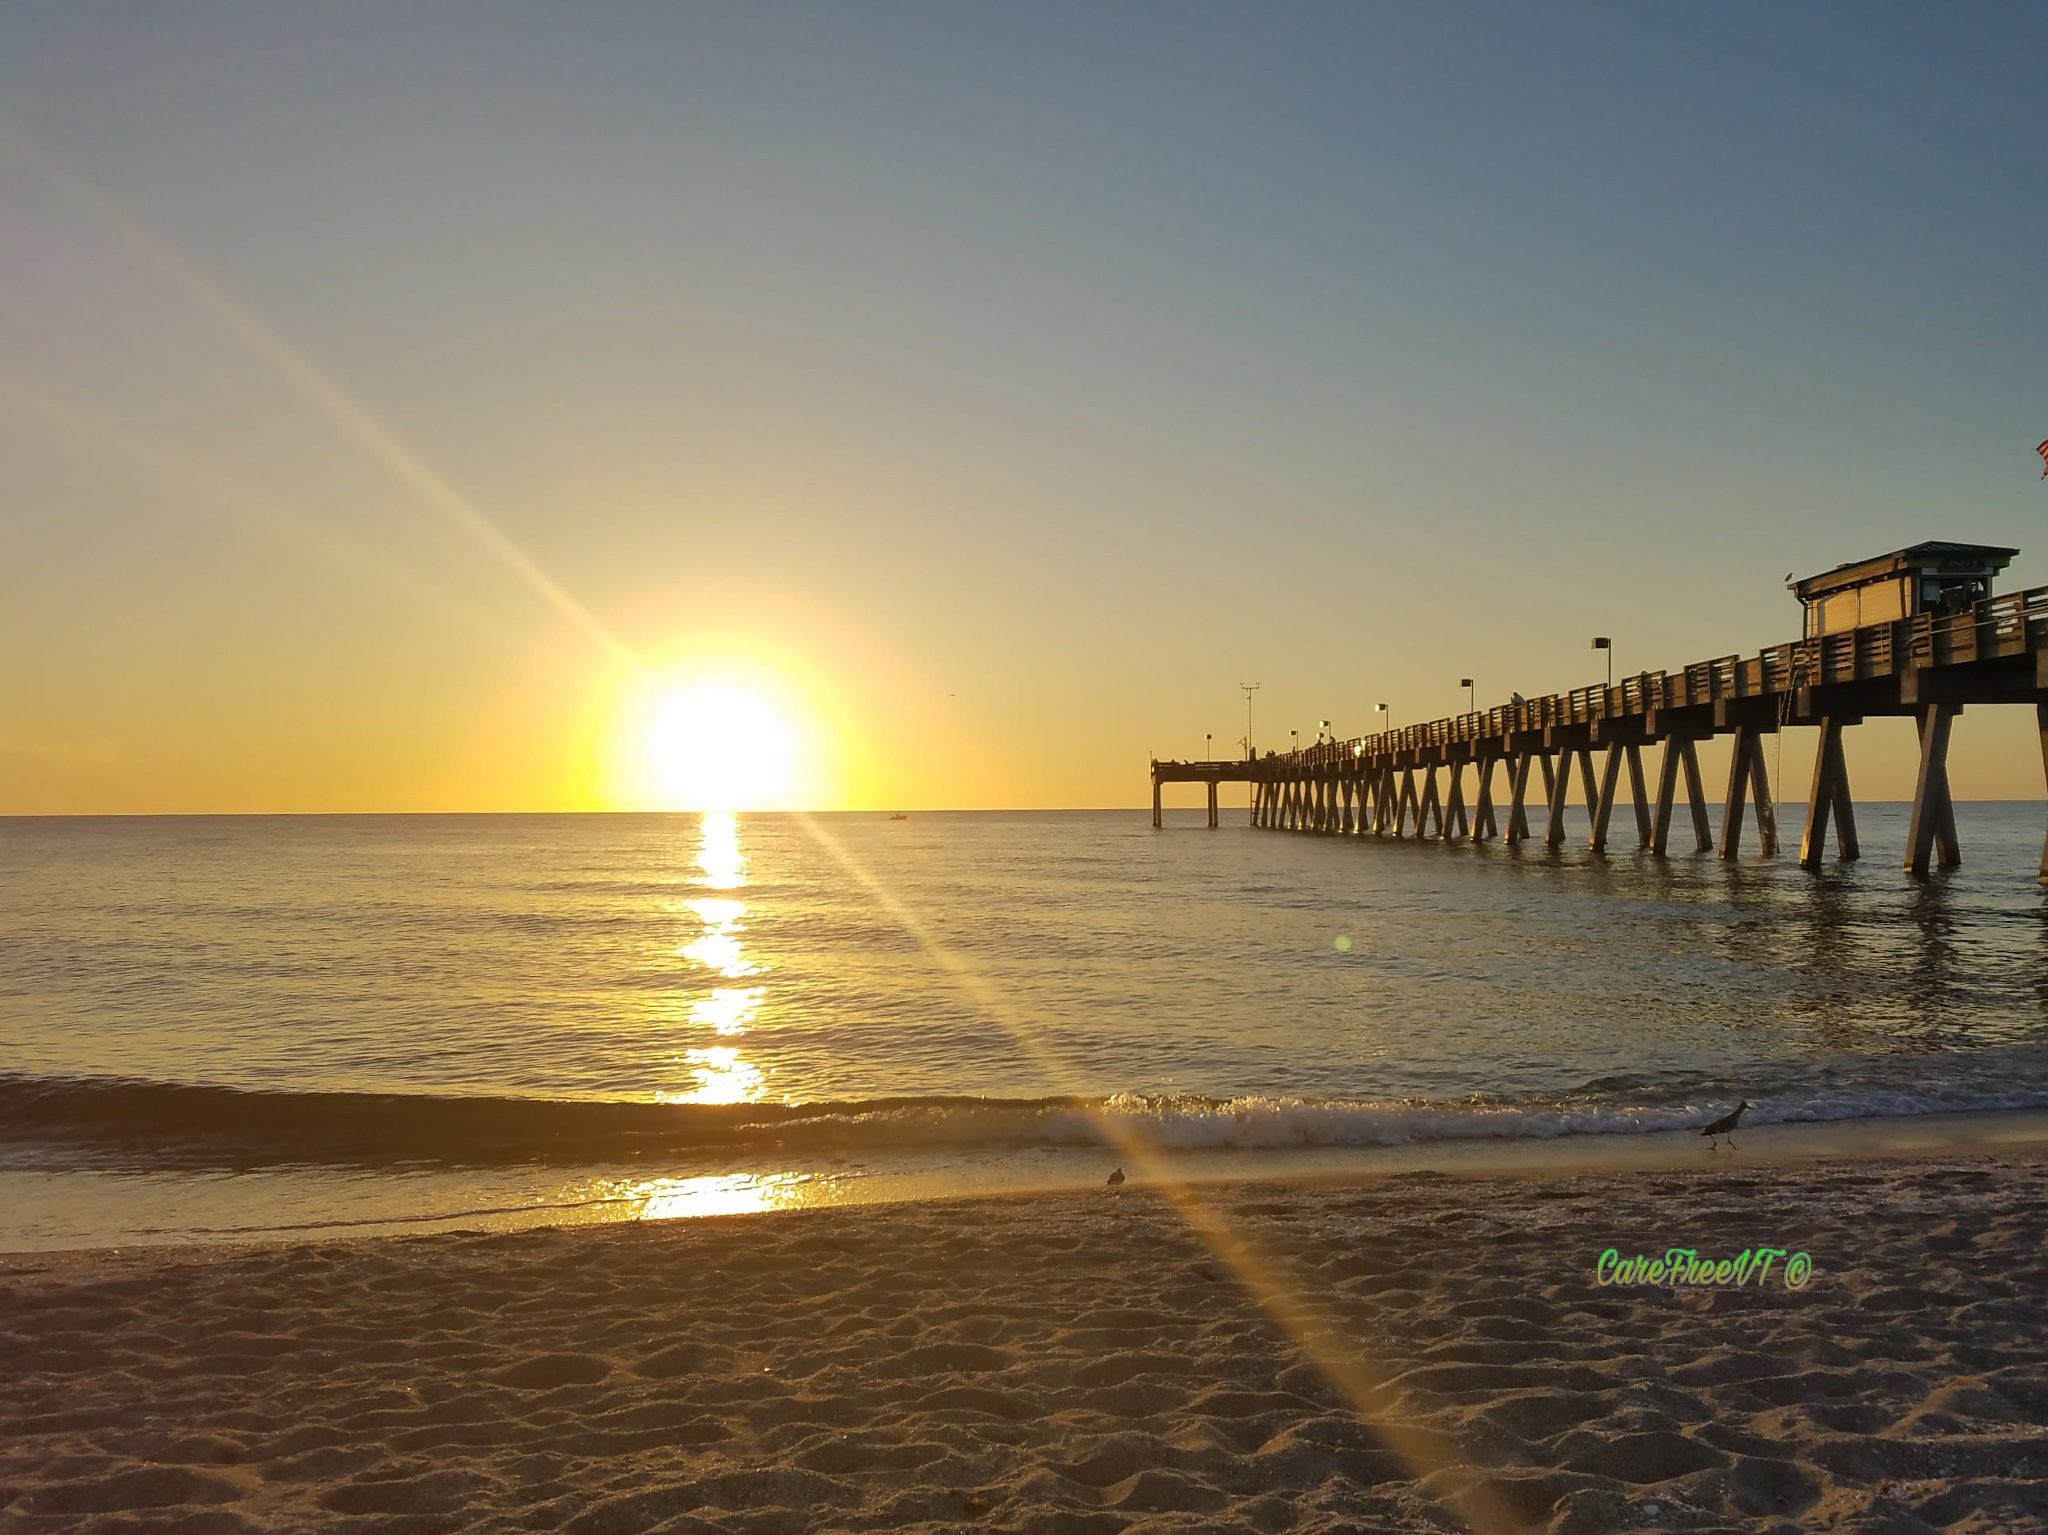 sunset near Sharky's by the Pier, Venice, FL  by CareFreeVT